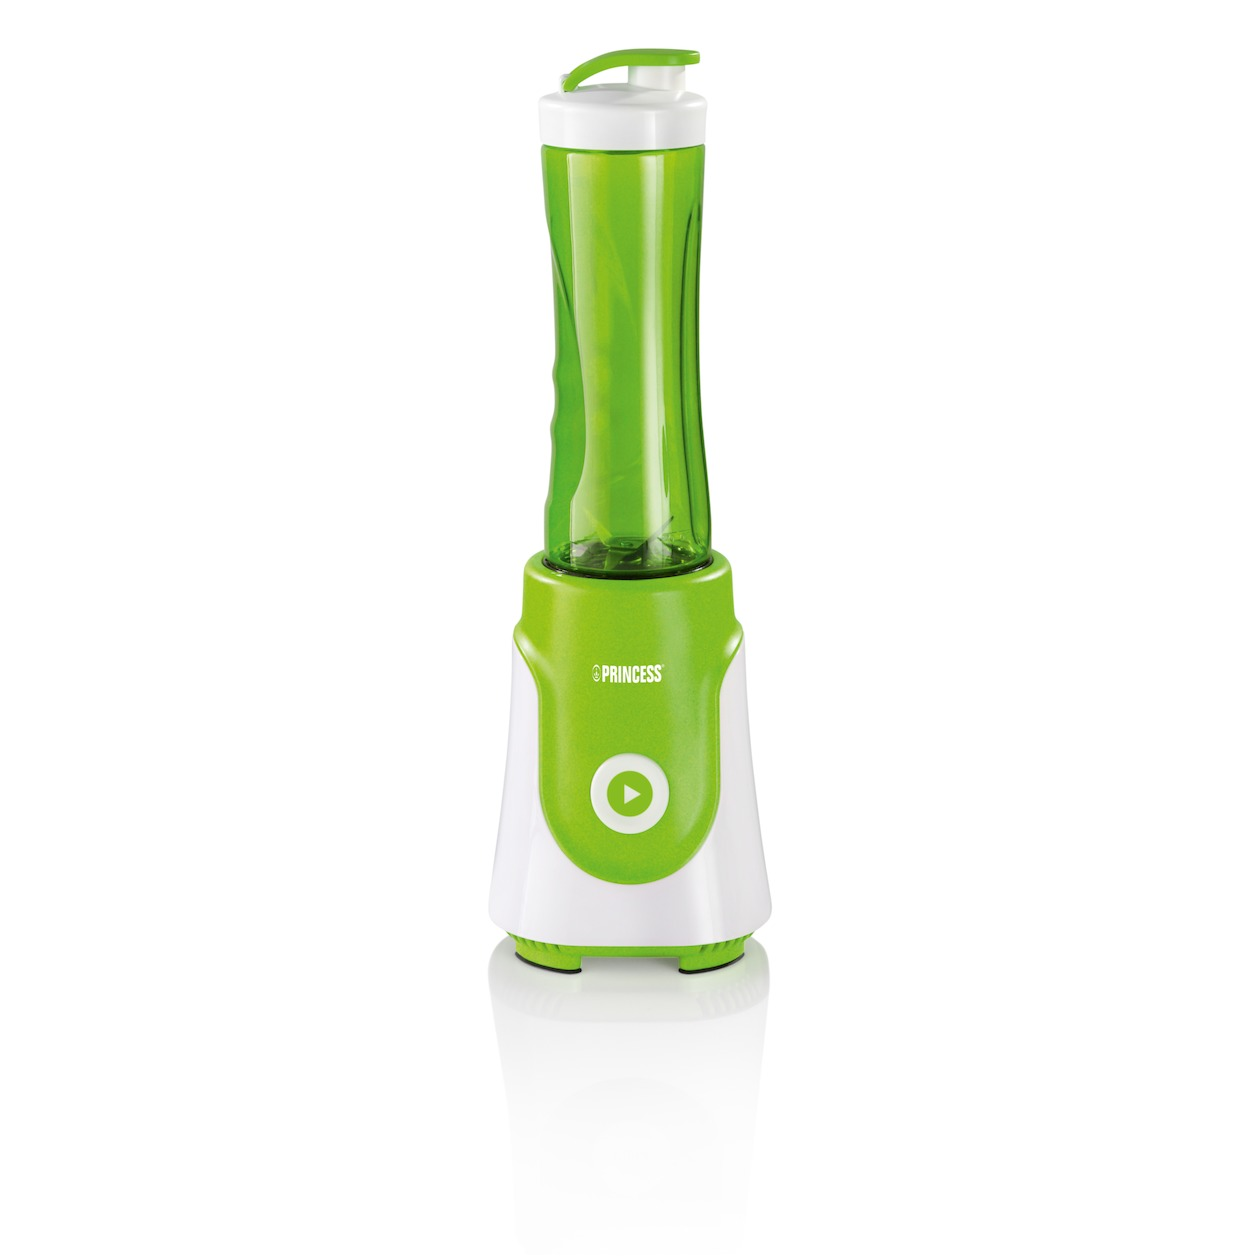 Princess 218000 Personal Blender groen